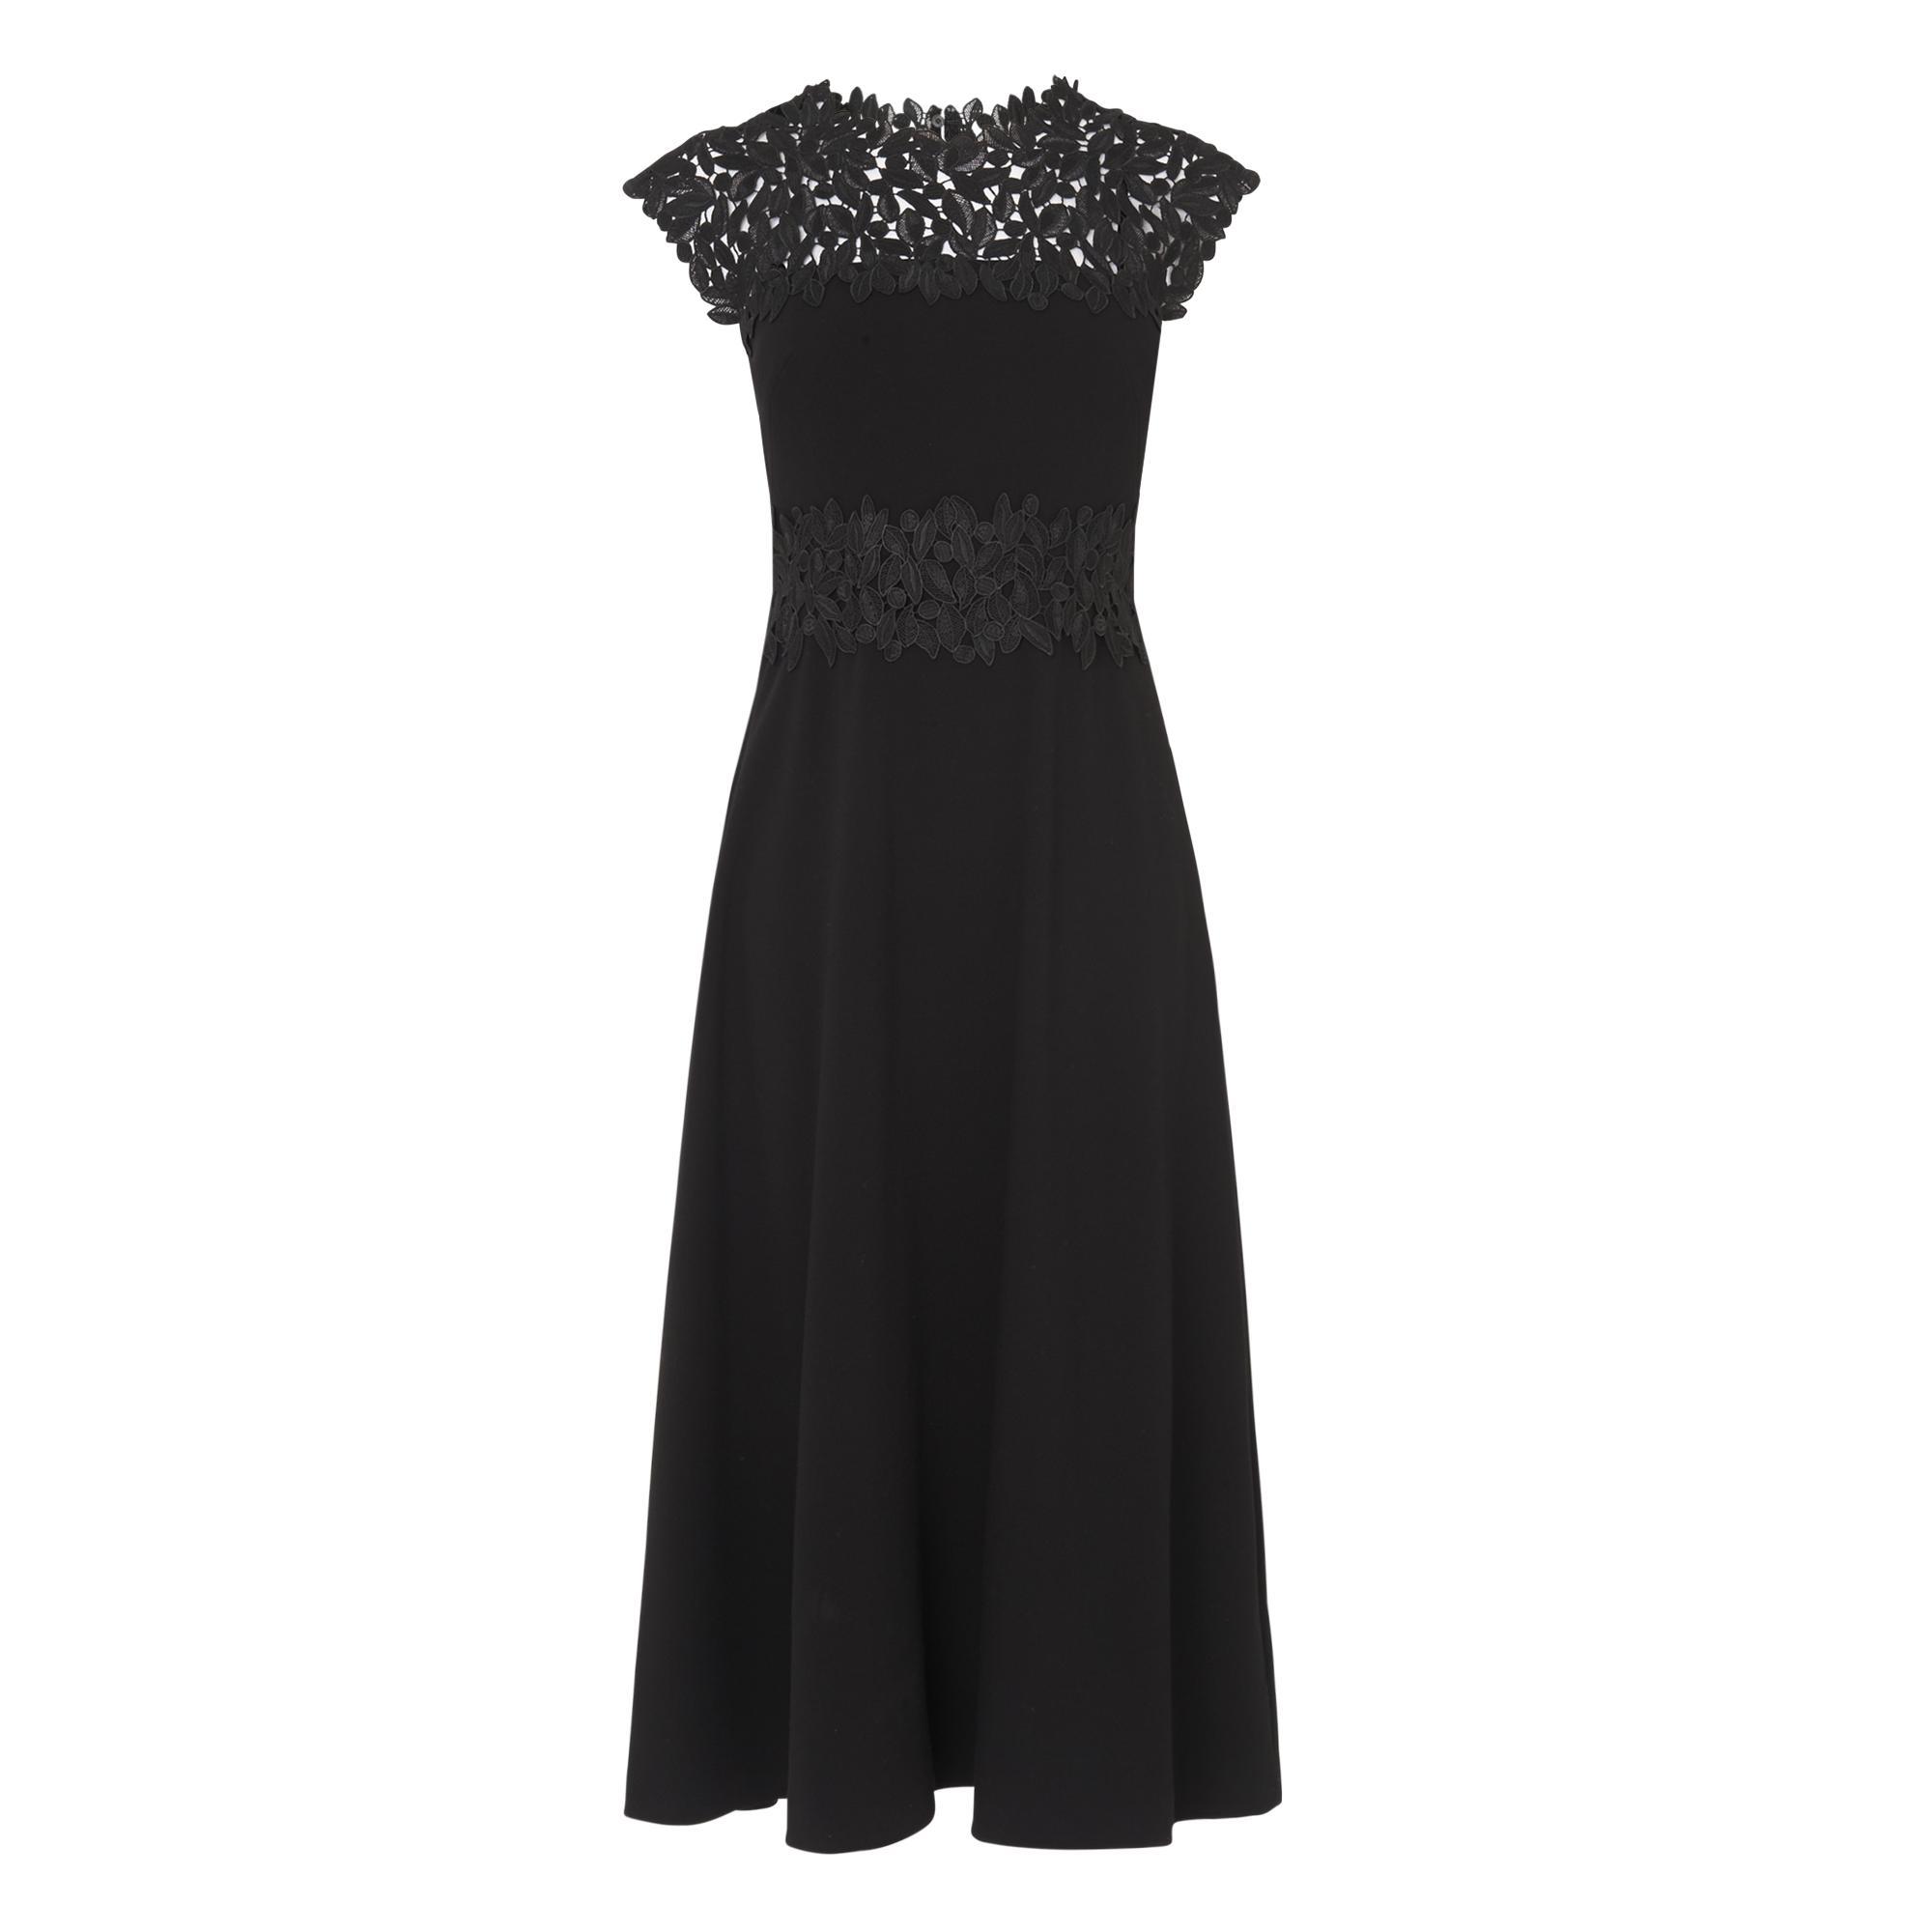 Salena Black Lace Dress